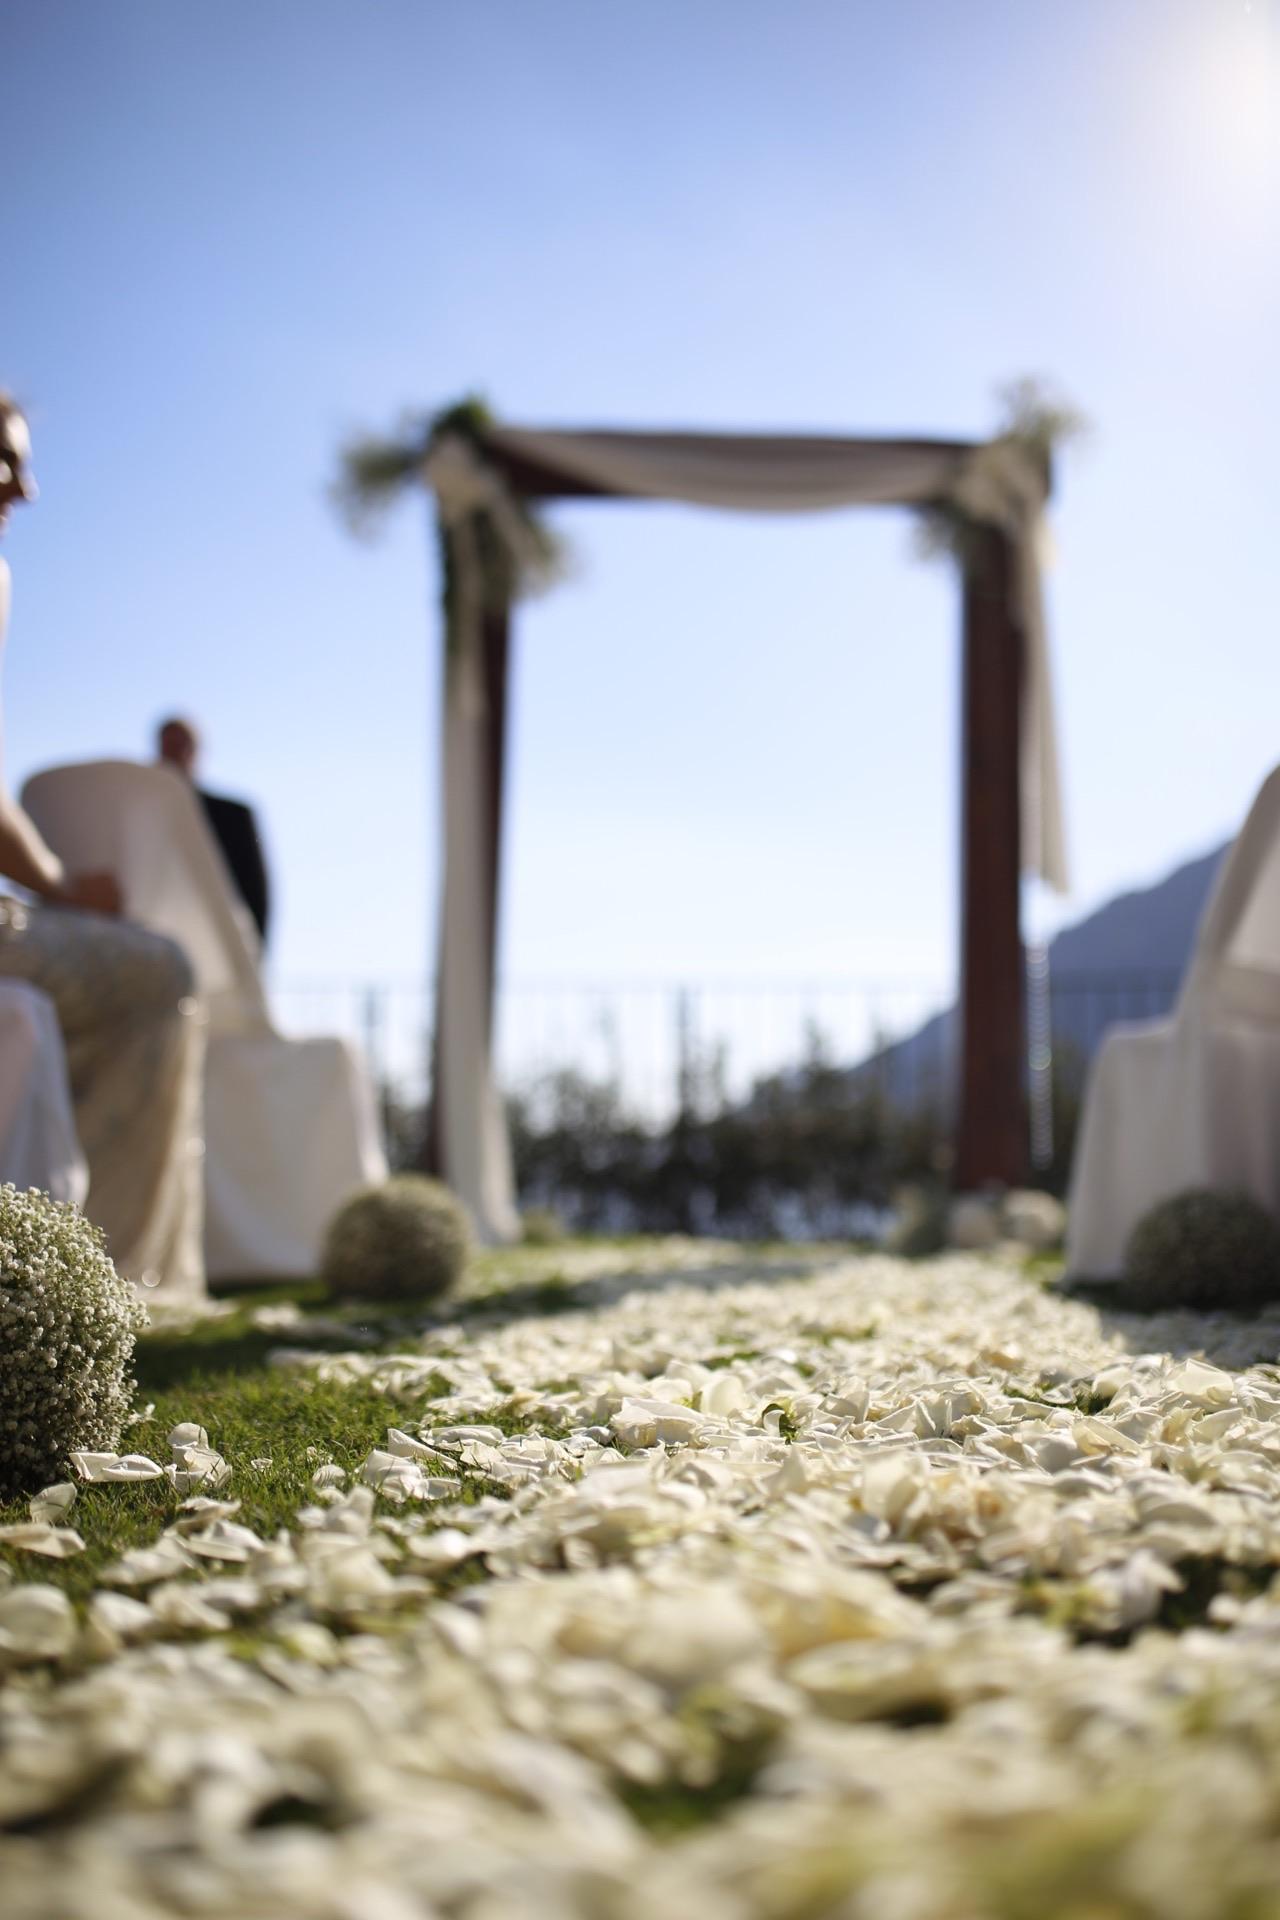 http://www.weddingamalfi.com/wp-content/uploads/Nathalie-and-Benjamin-Wedding-in-Positano-Italy-21.jpg